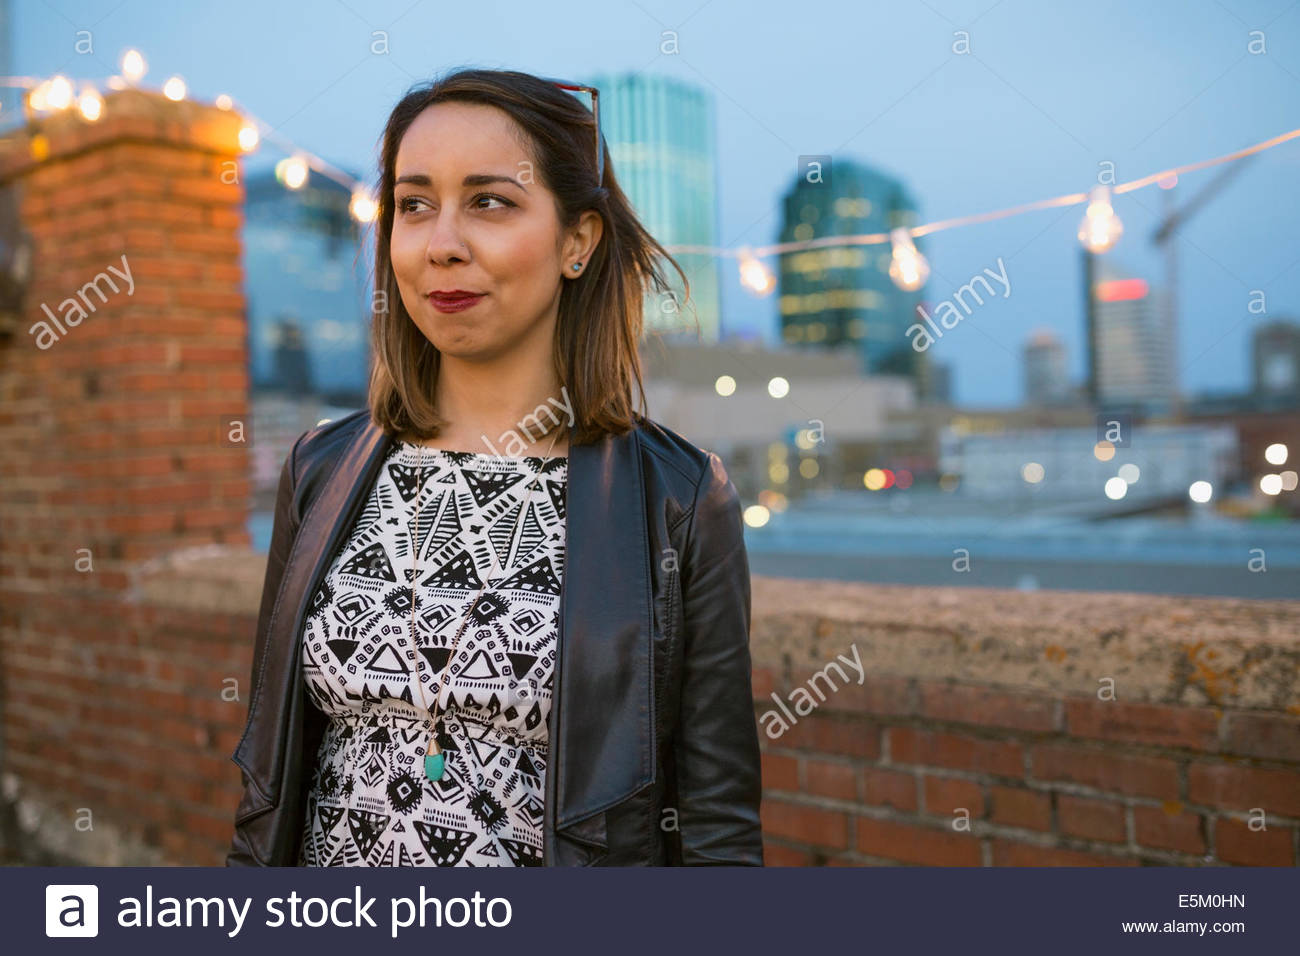 Mulher sorridente olhando longe no último piso urbano Imagens de Stock